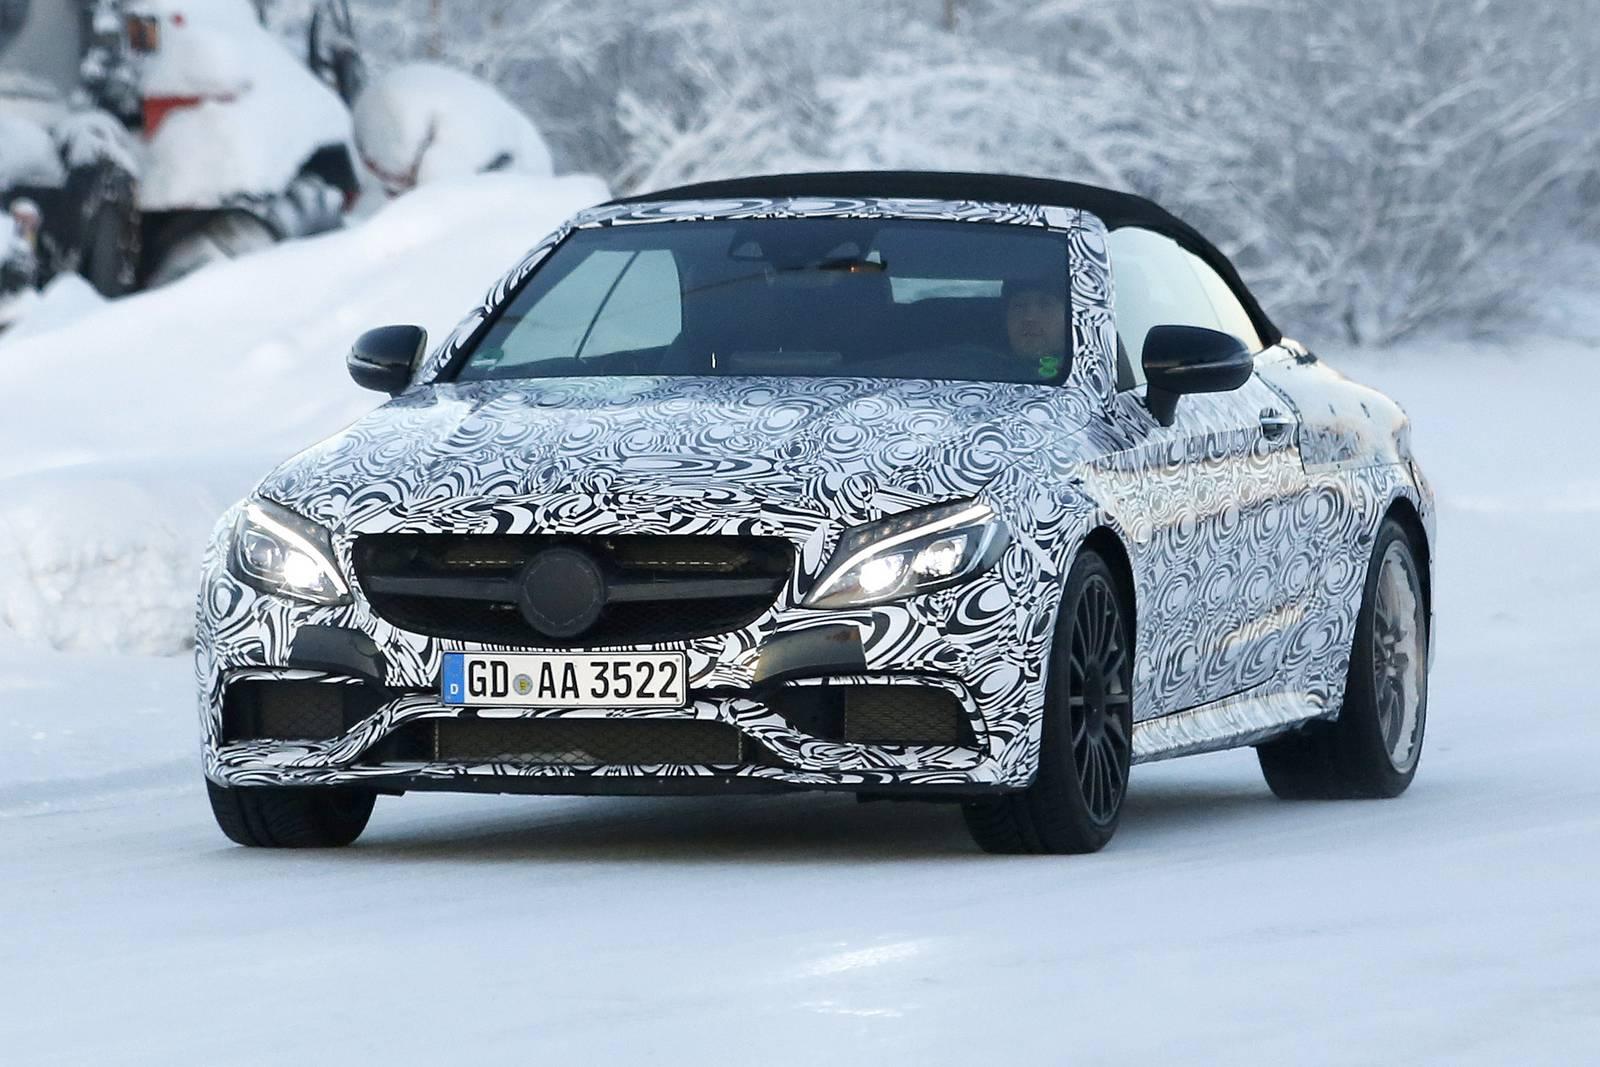 2017 Mercedes-Benz C63 AMG Cabriolet Spy Shots 7